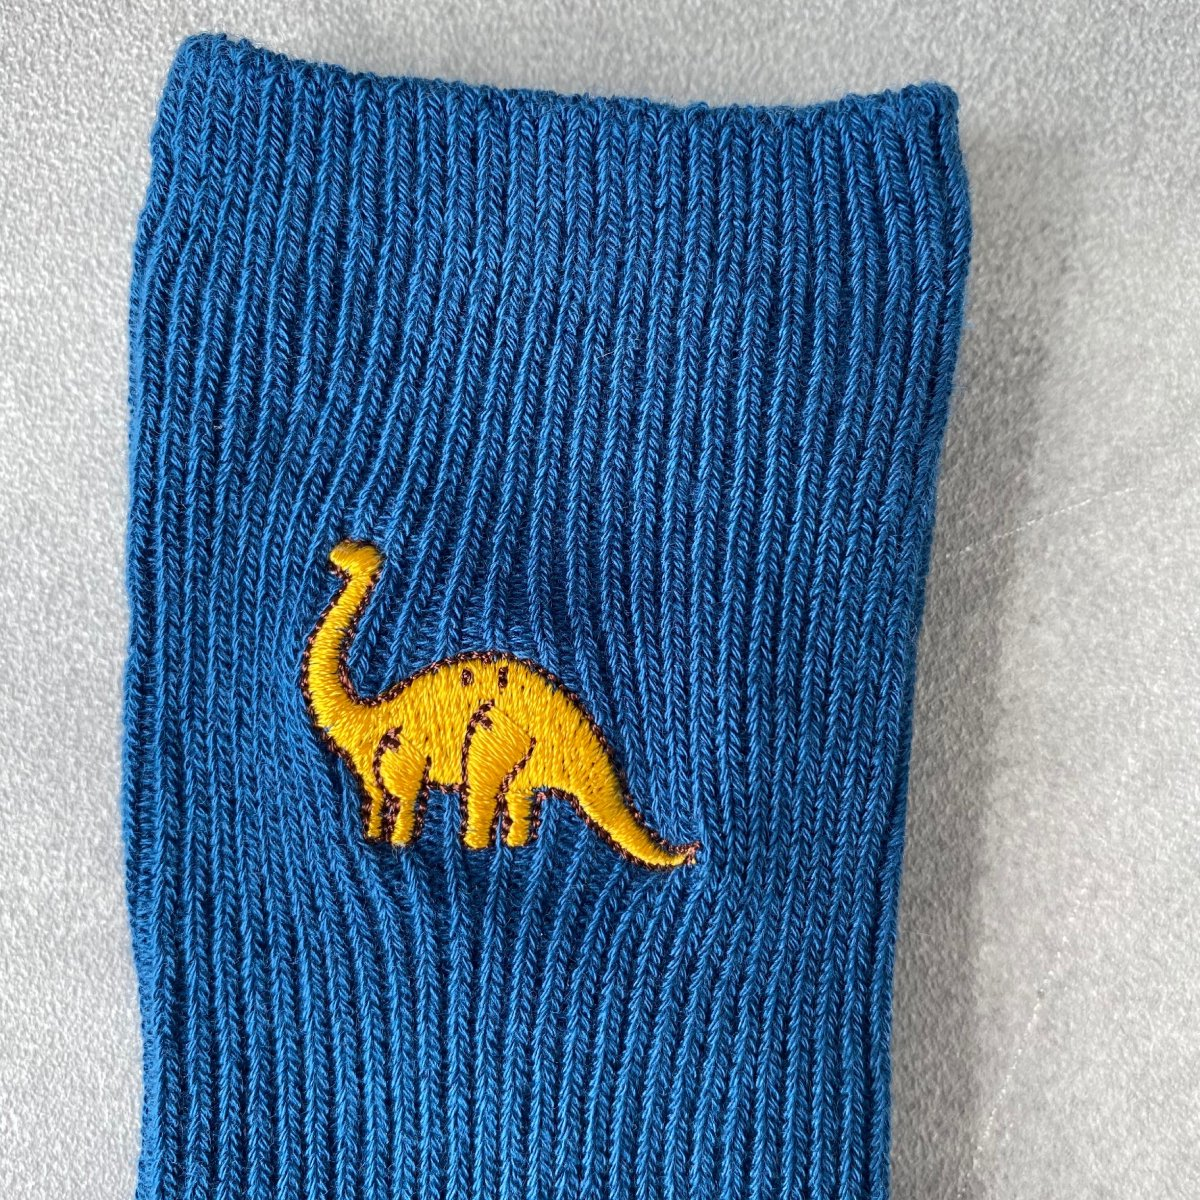 【BABY】Dino Socks 詳細画像10